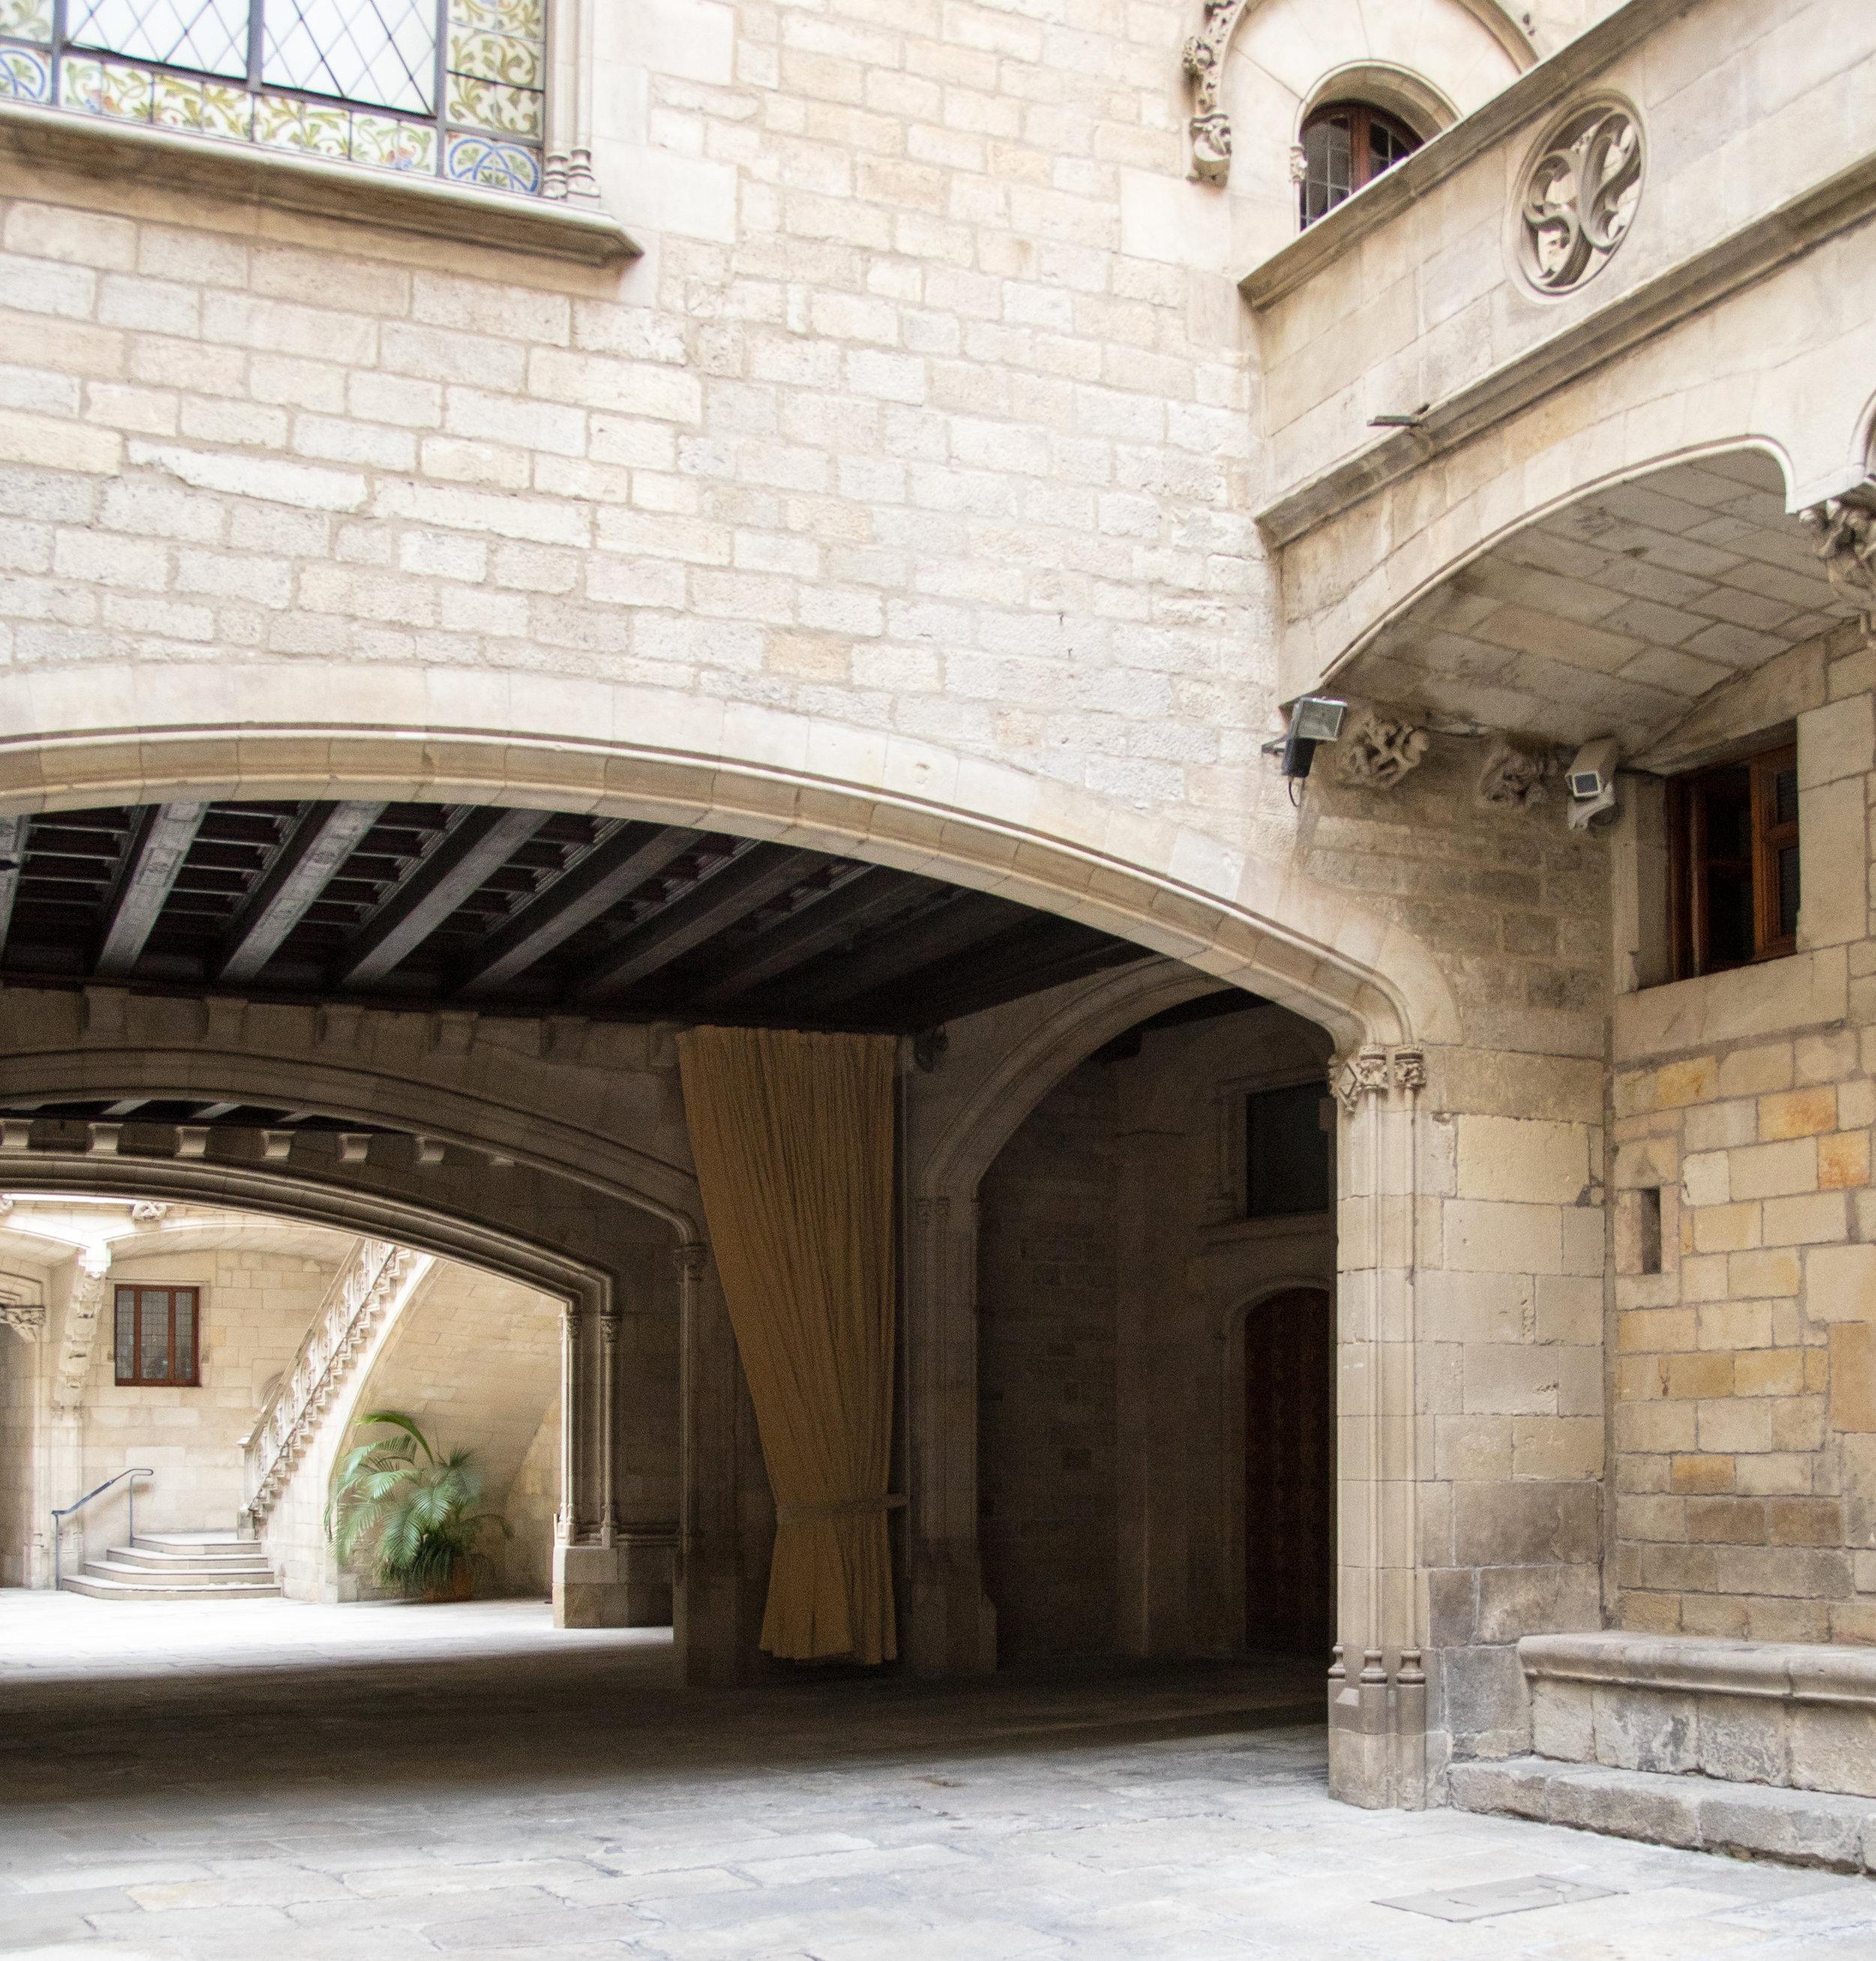 Gothic Quarters - Barcelona, Spain